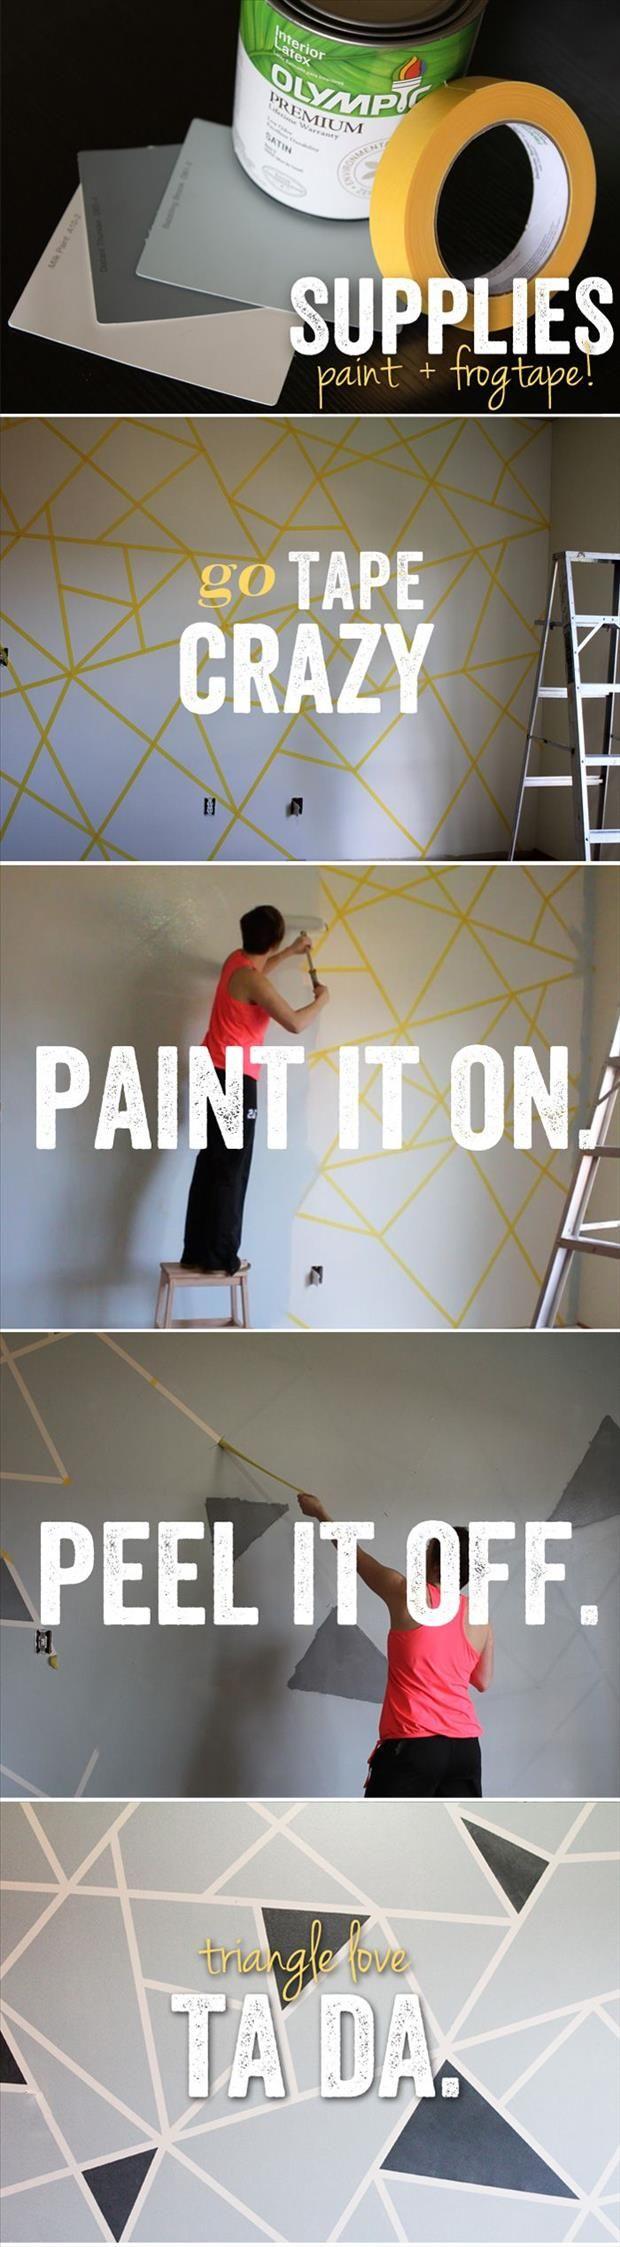 best household hacks images on pinterest home ideas bedroom